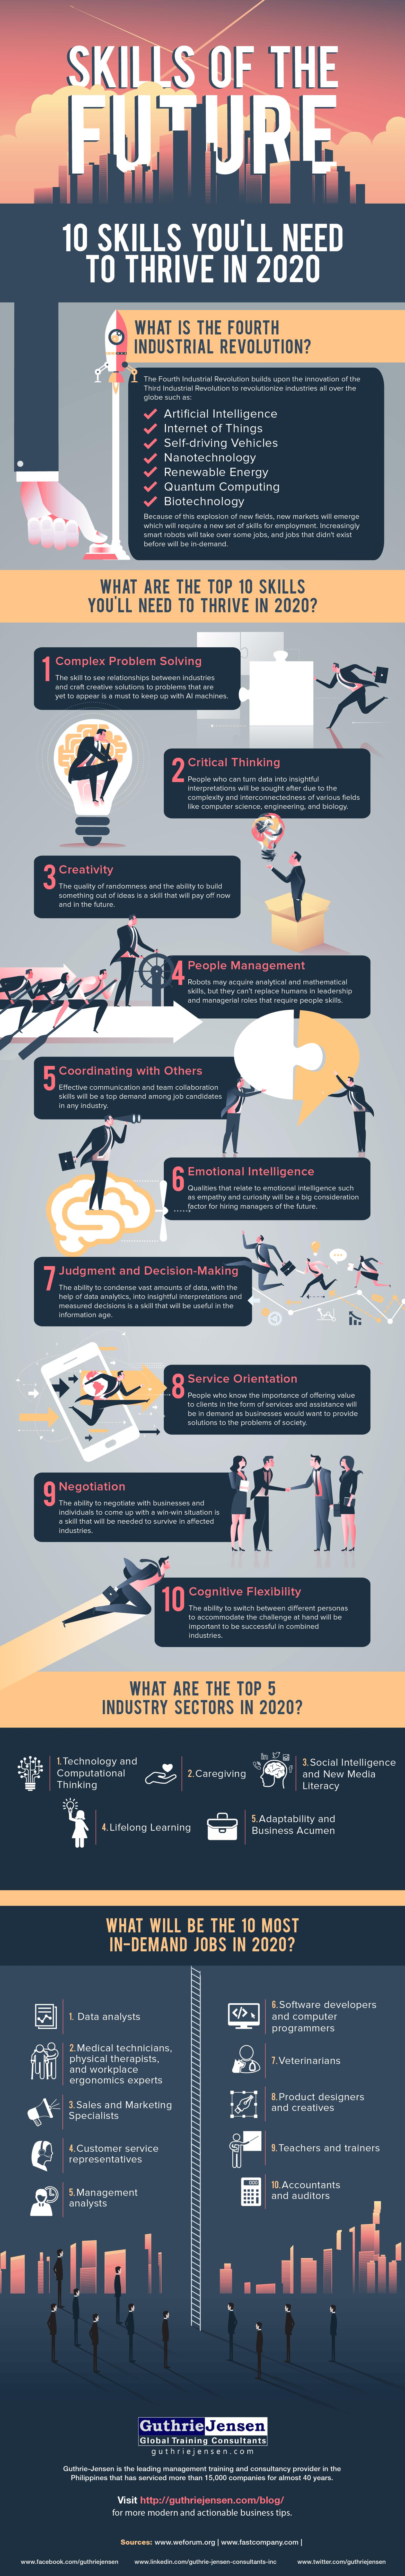 10 skills for 2020